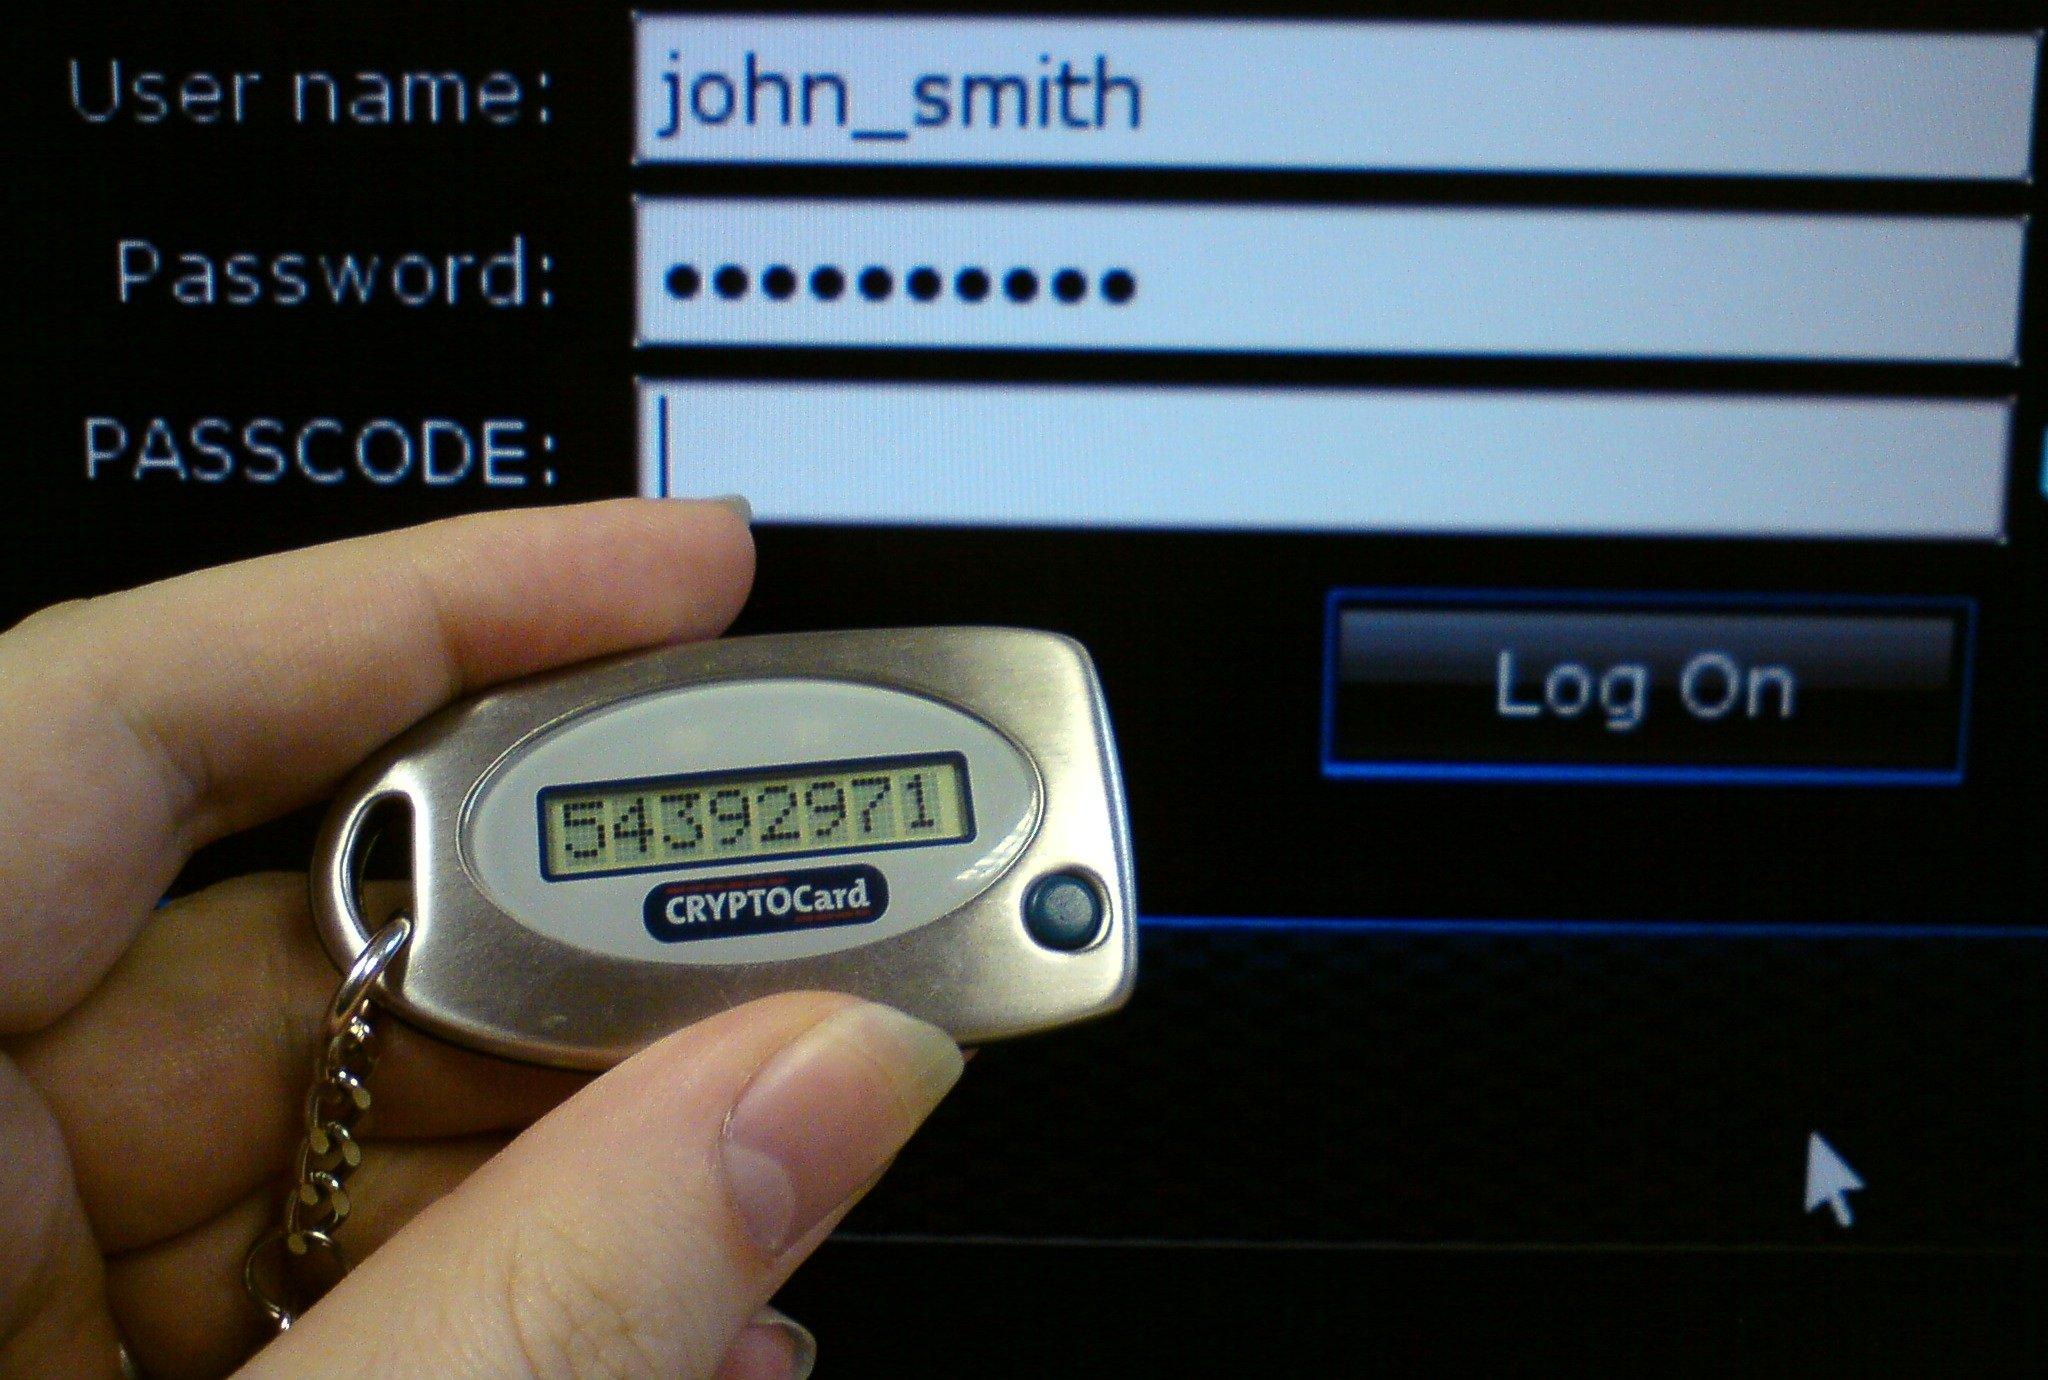 Tackling Cybercrime with the Legislation Unicorn